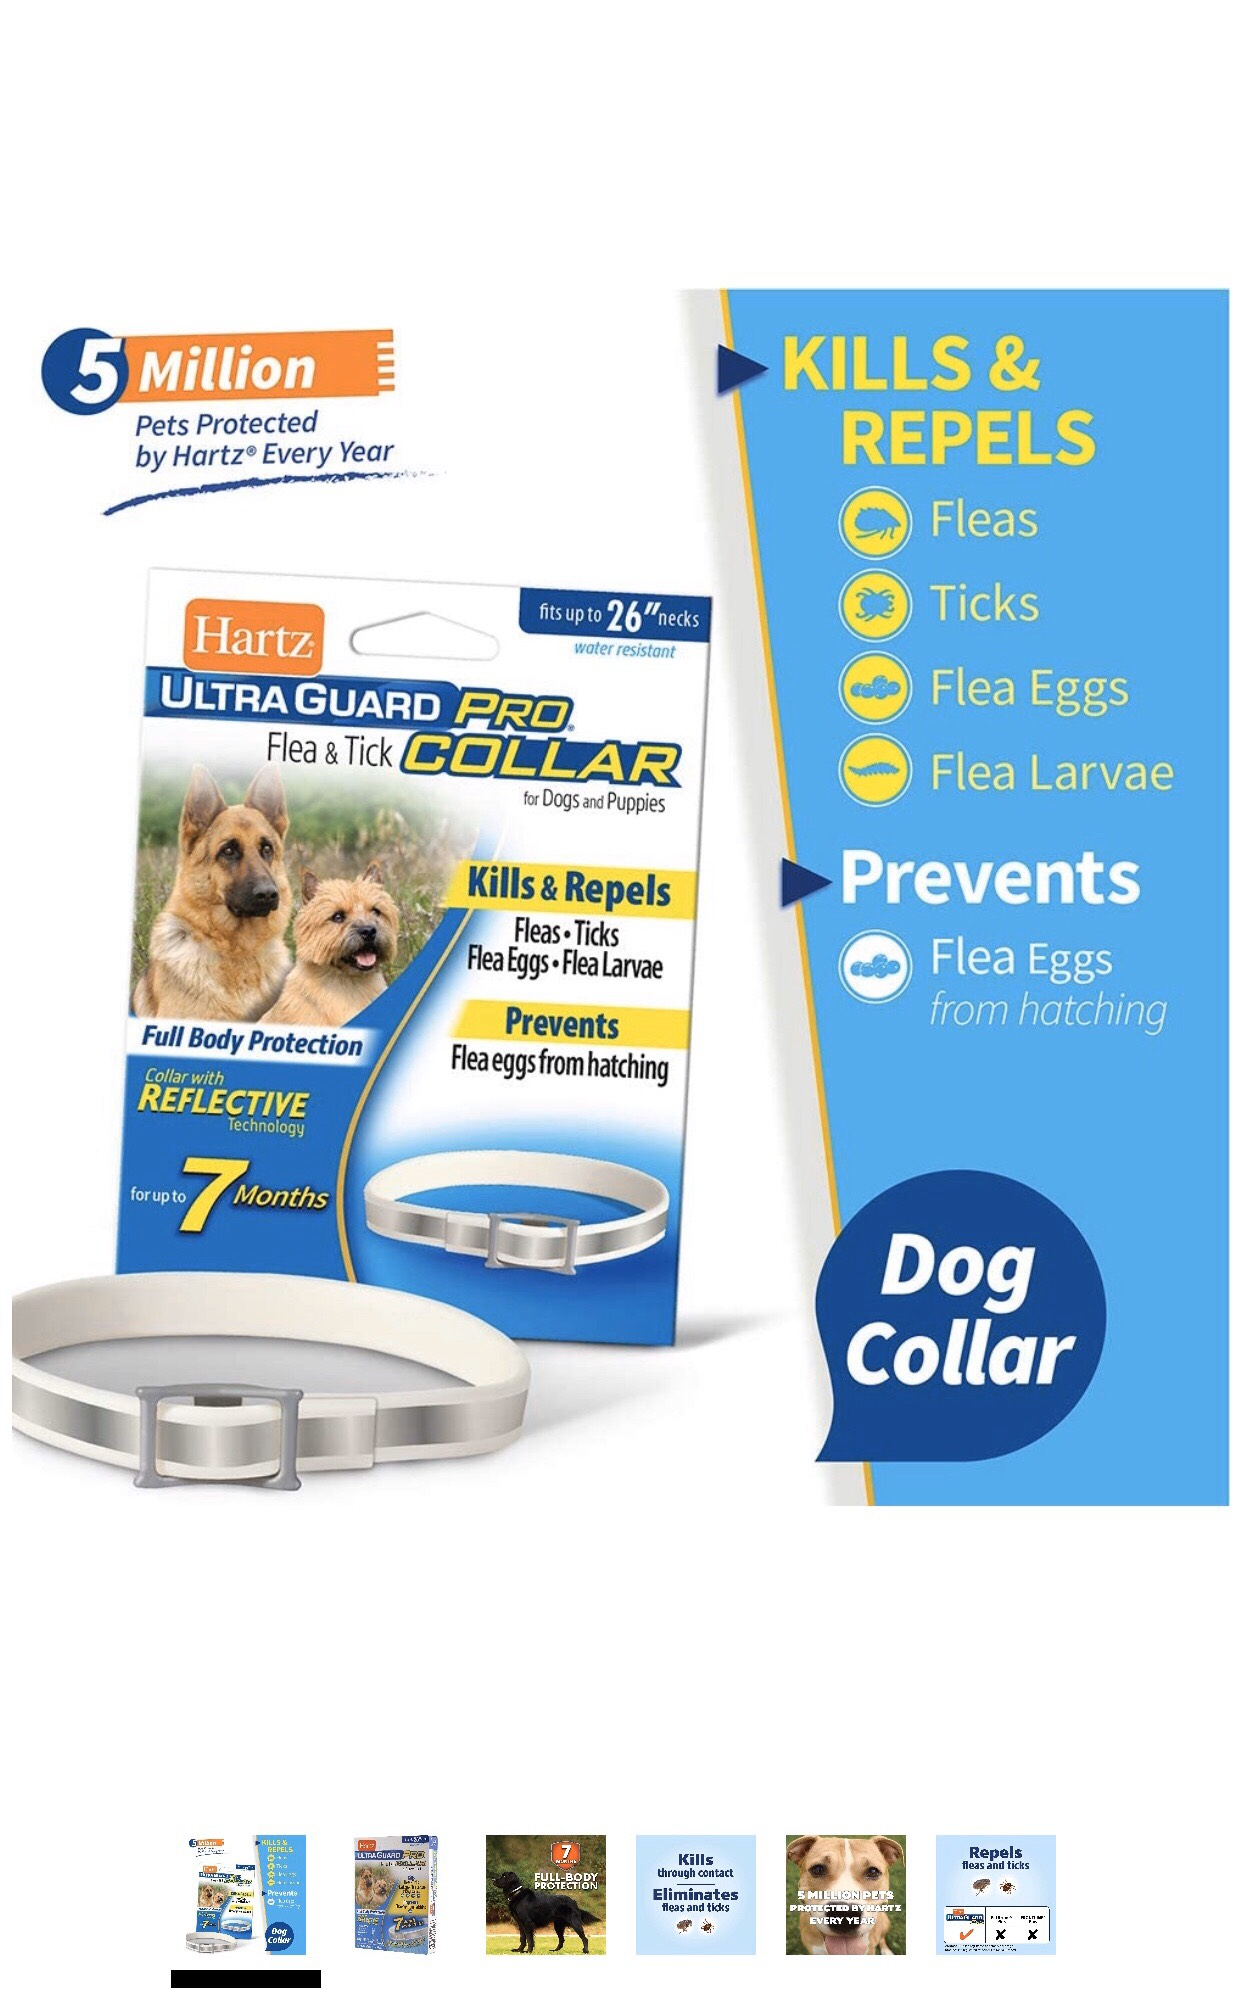 Hartz Ultra Guard Flea & Tick Pro Collar for Dogs